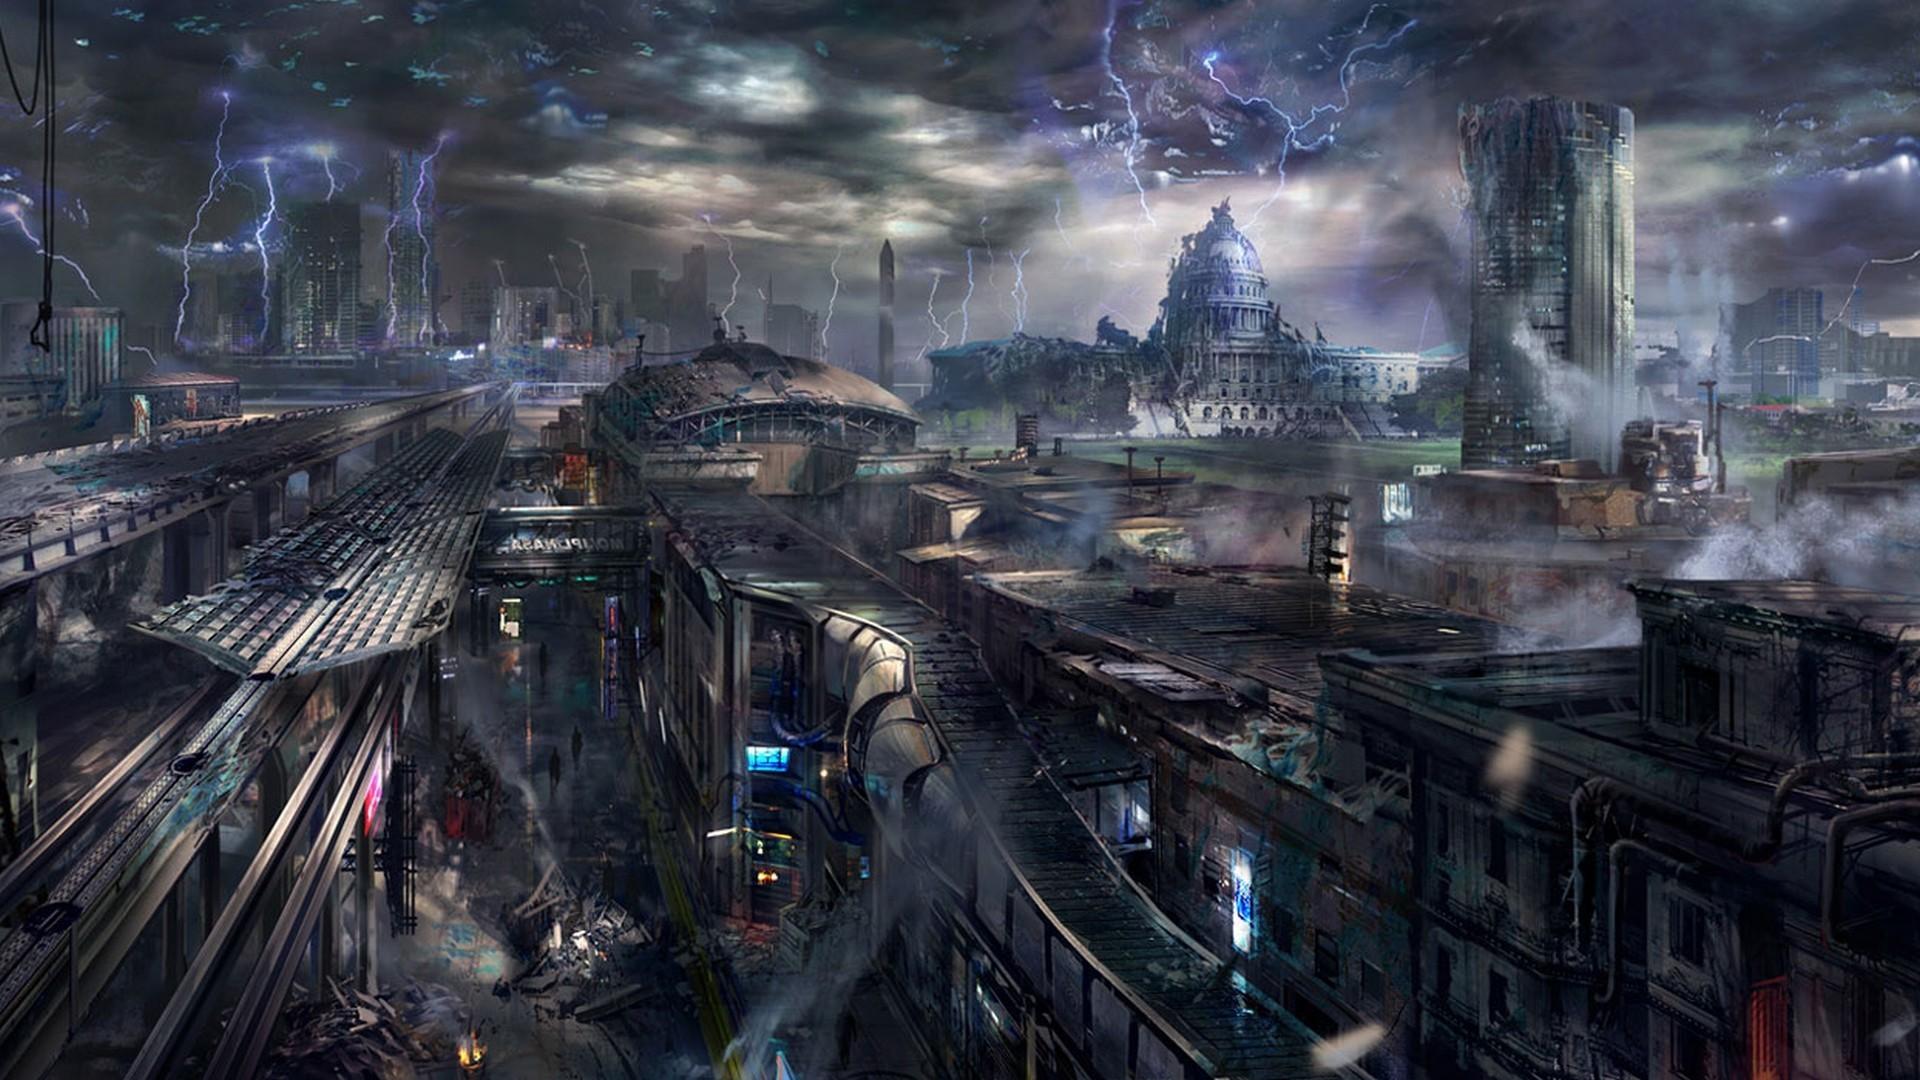 Futuristic smoke destruction buildings science fiction lightning wallpaper      65454   WallpaperUP